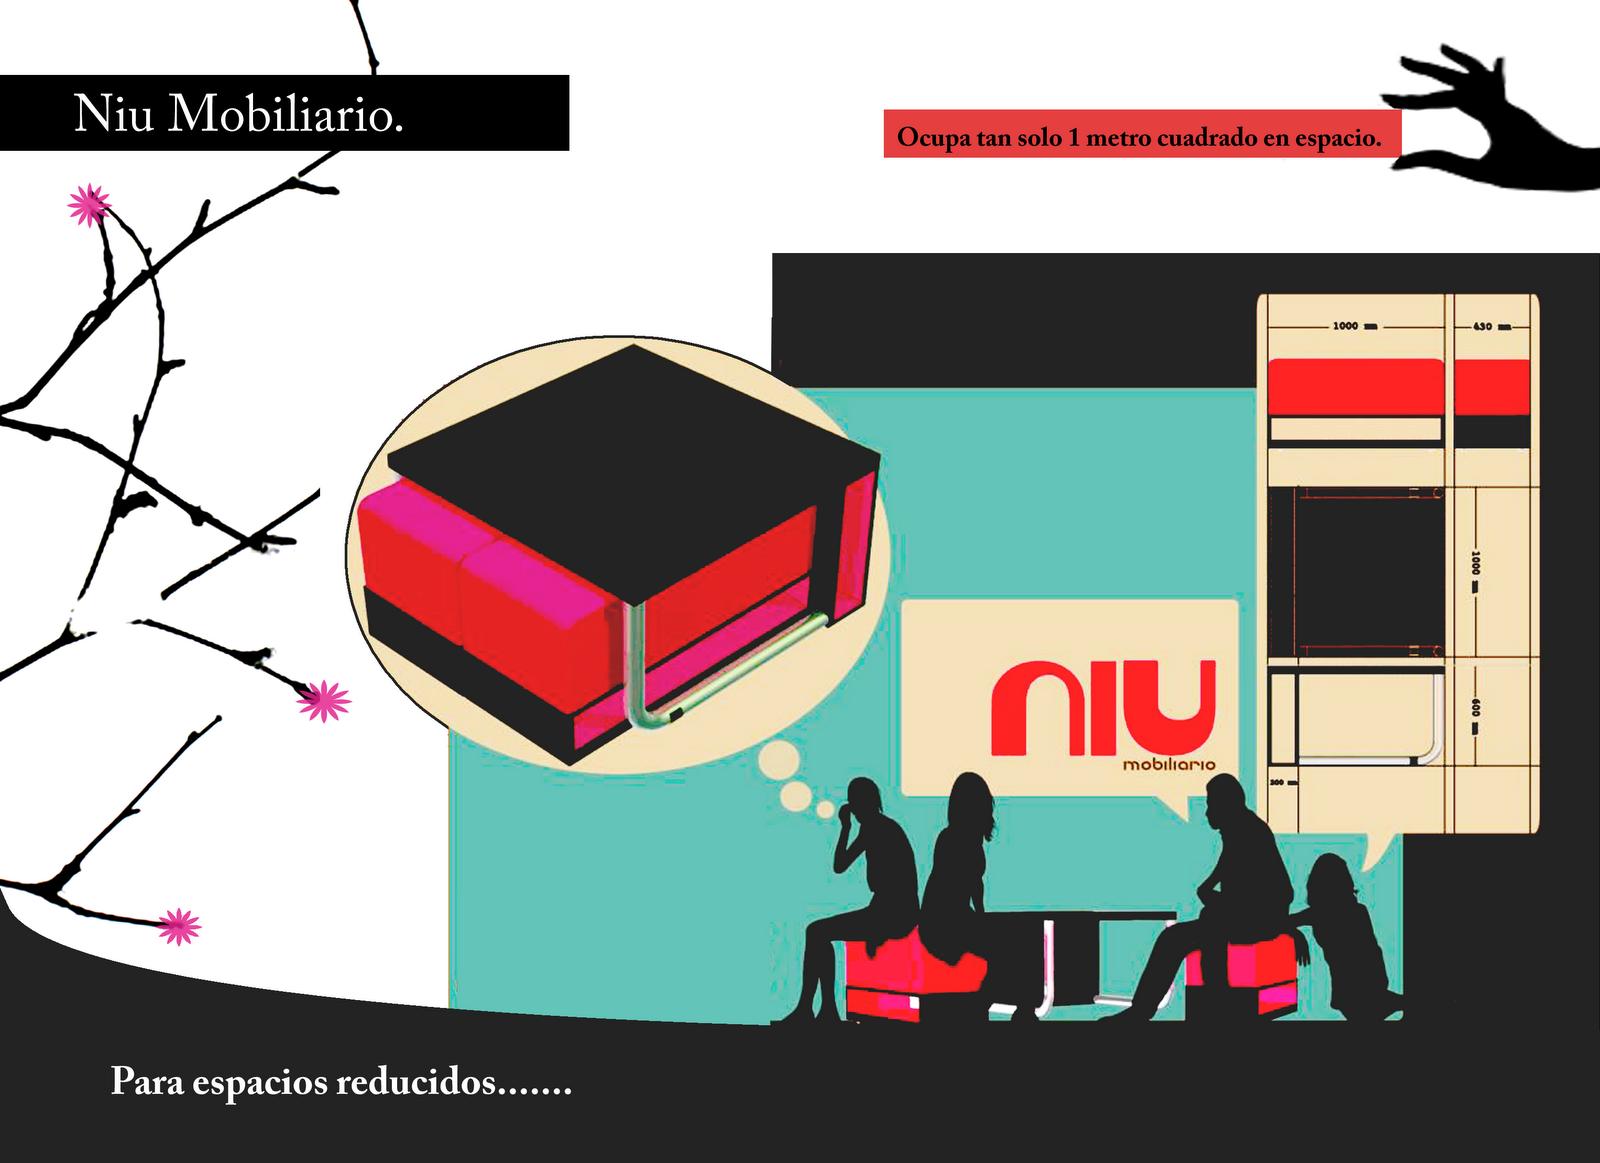 Melisa rico mobiliario para espacios reducidos Mobiliario para espacios reducidos